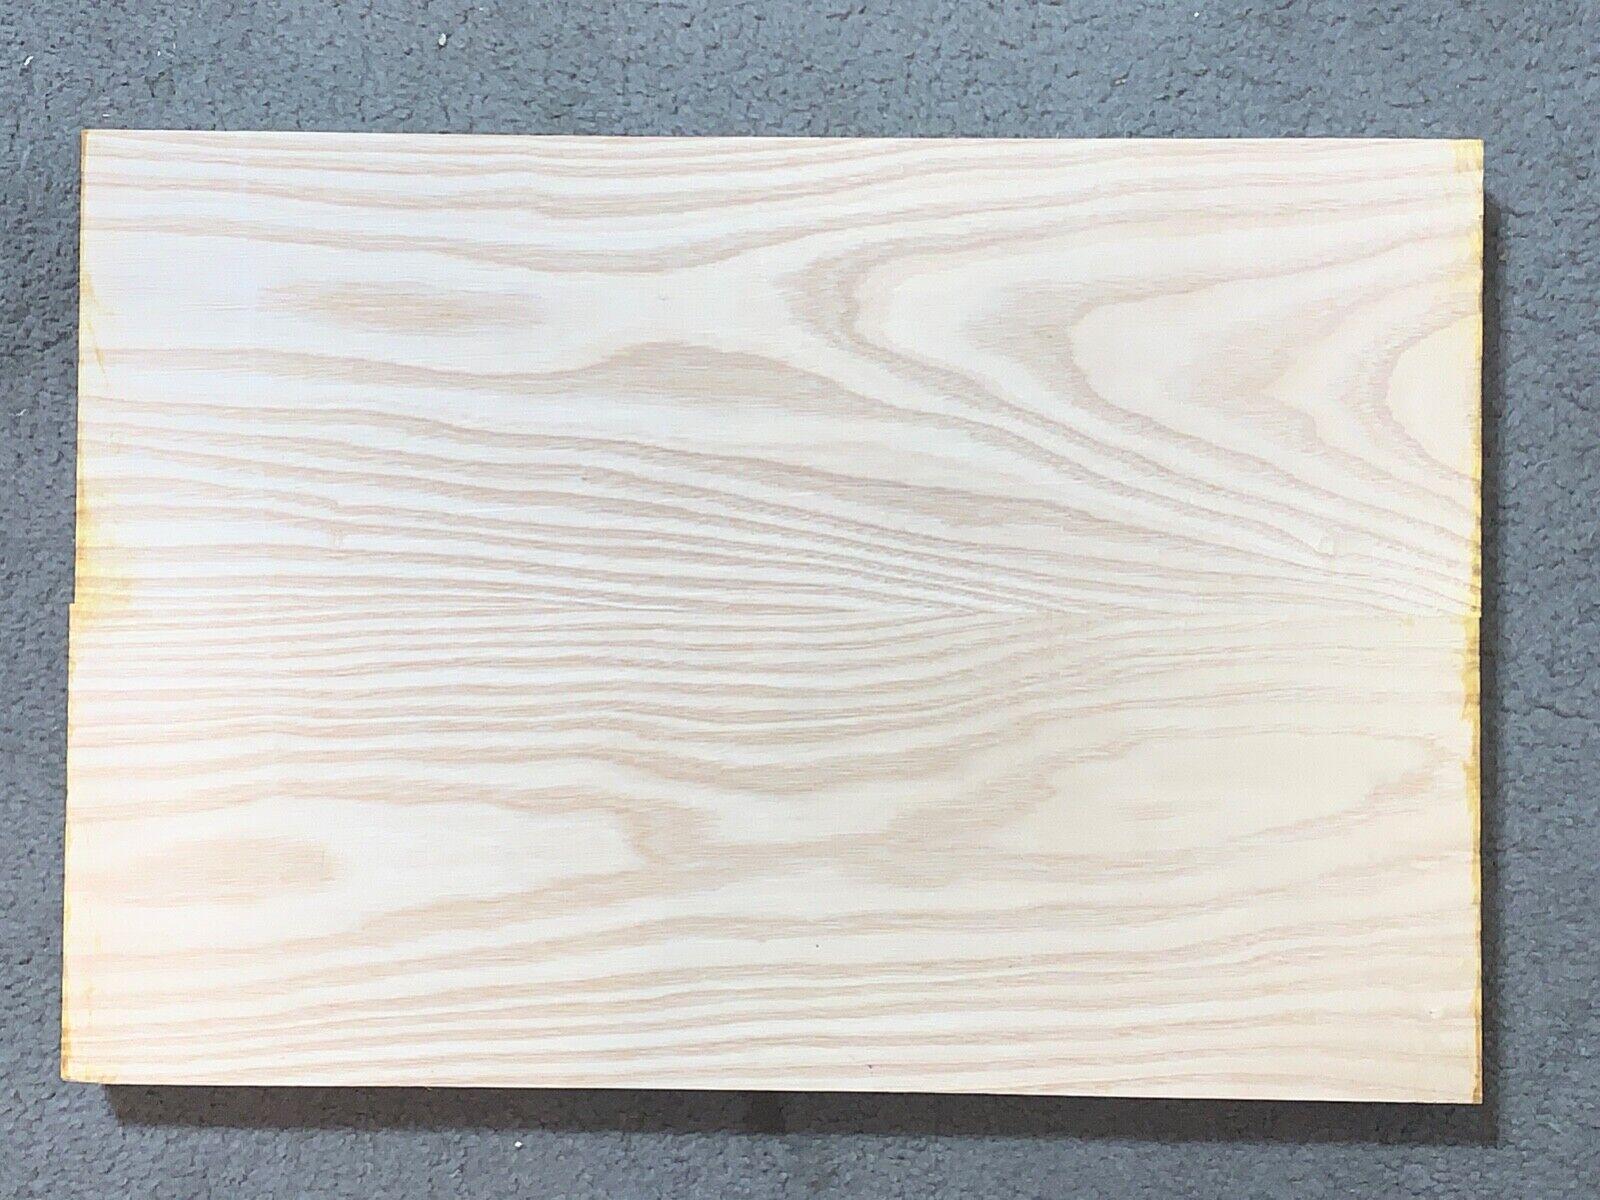 WHITE ASH Guitar Body Blanks- 2 Glued Piece 21 X 14 X 2 FREE SHIPPING  - $48.00